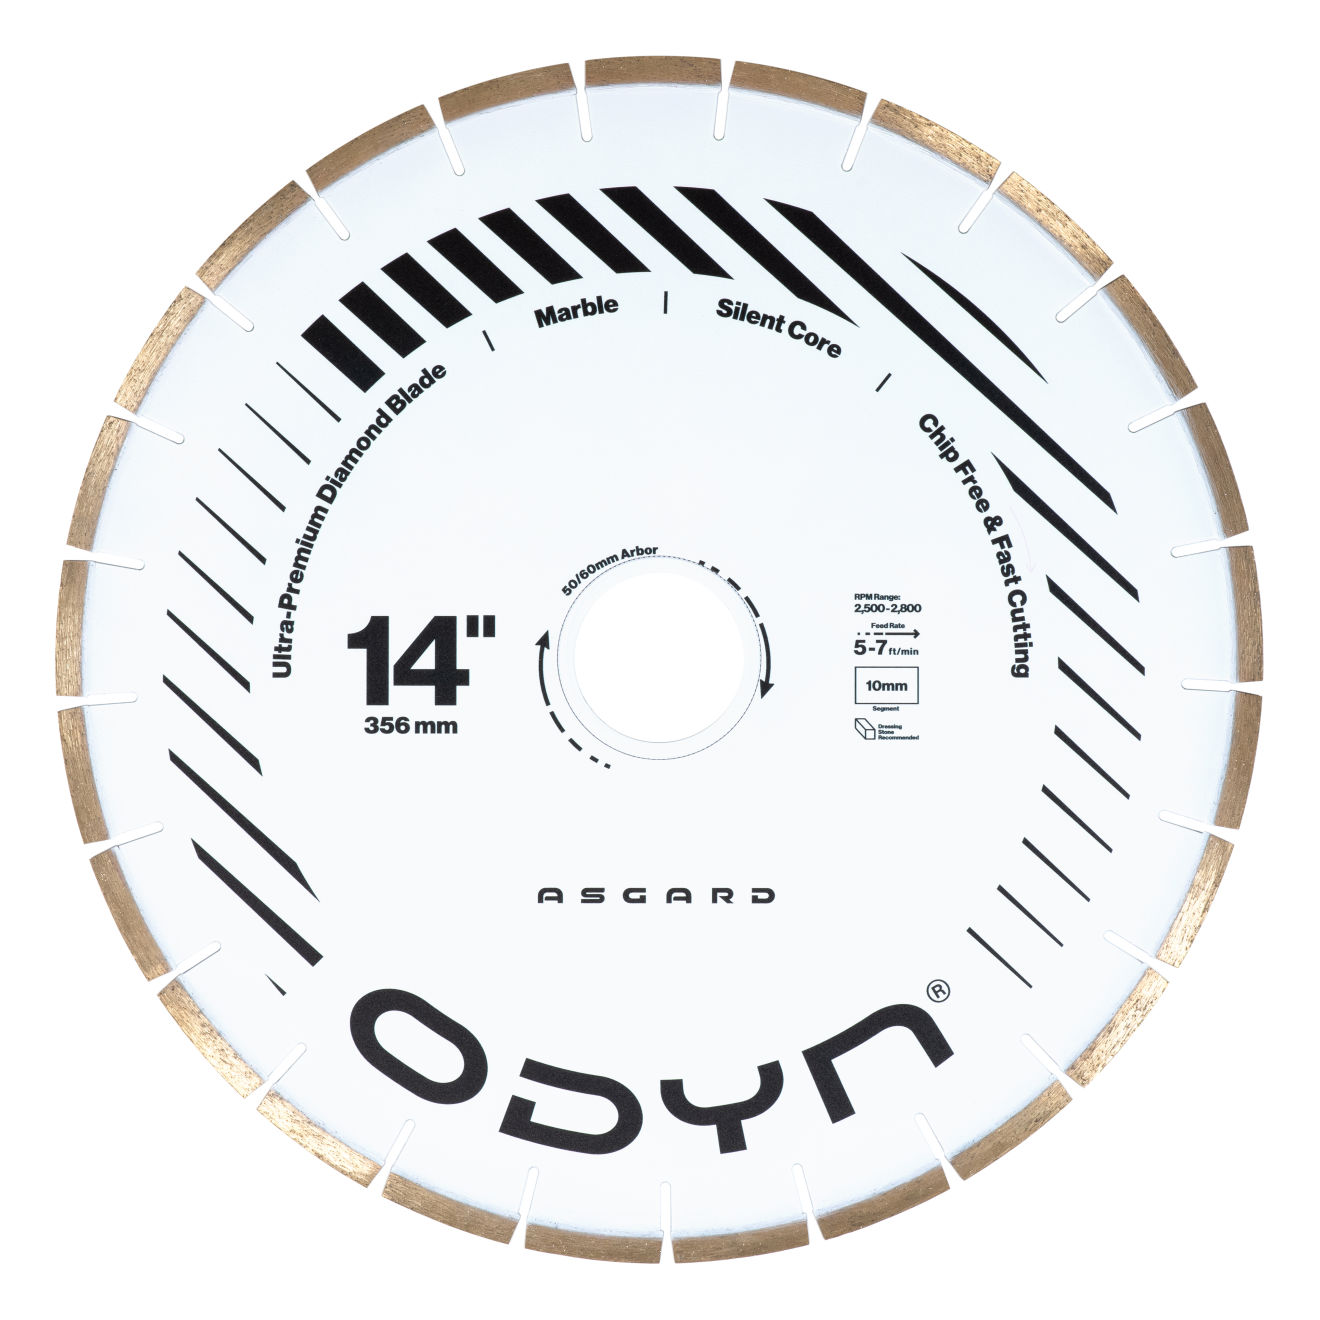 "Odyn 14"" Asgard Ultra-Premium Marble Blade"